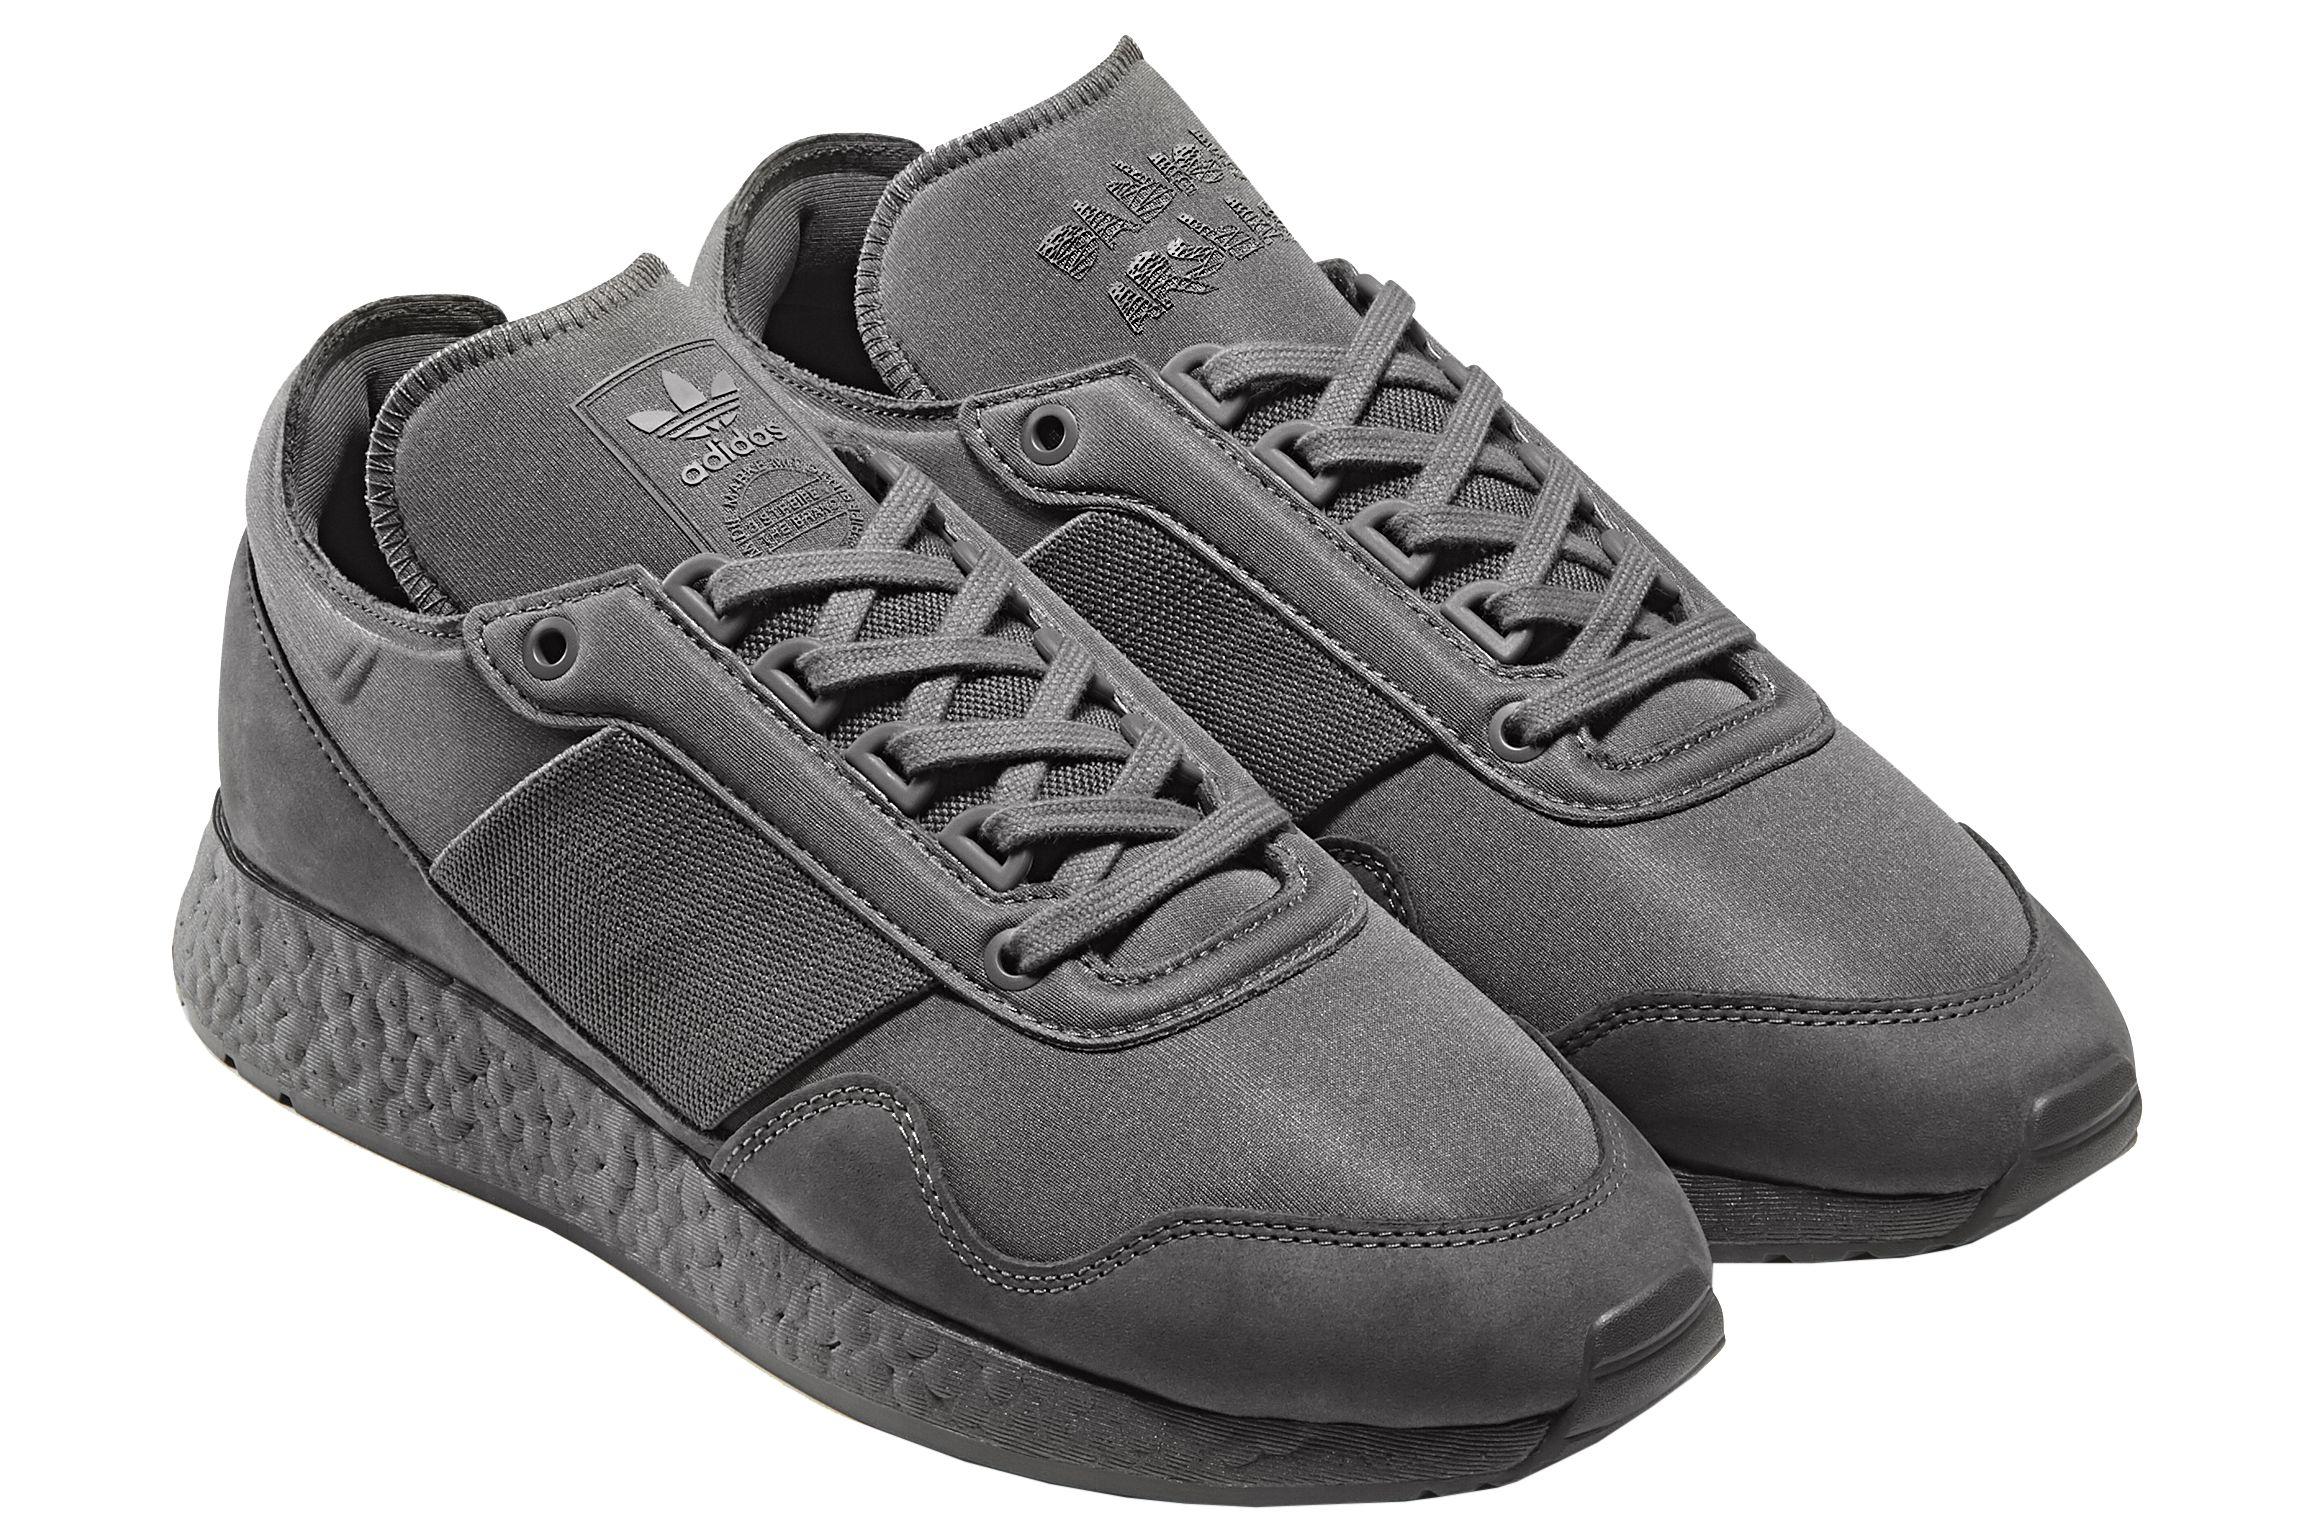 these are the 13 coolest sneakers of the week  Neu Adidas Mystery Ink Bademntel Herren Online Bestellen P 1901 #21